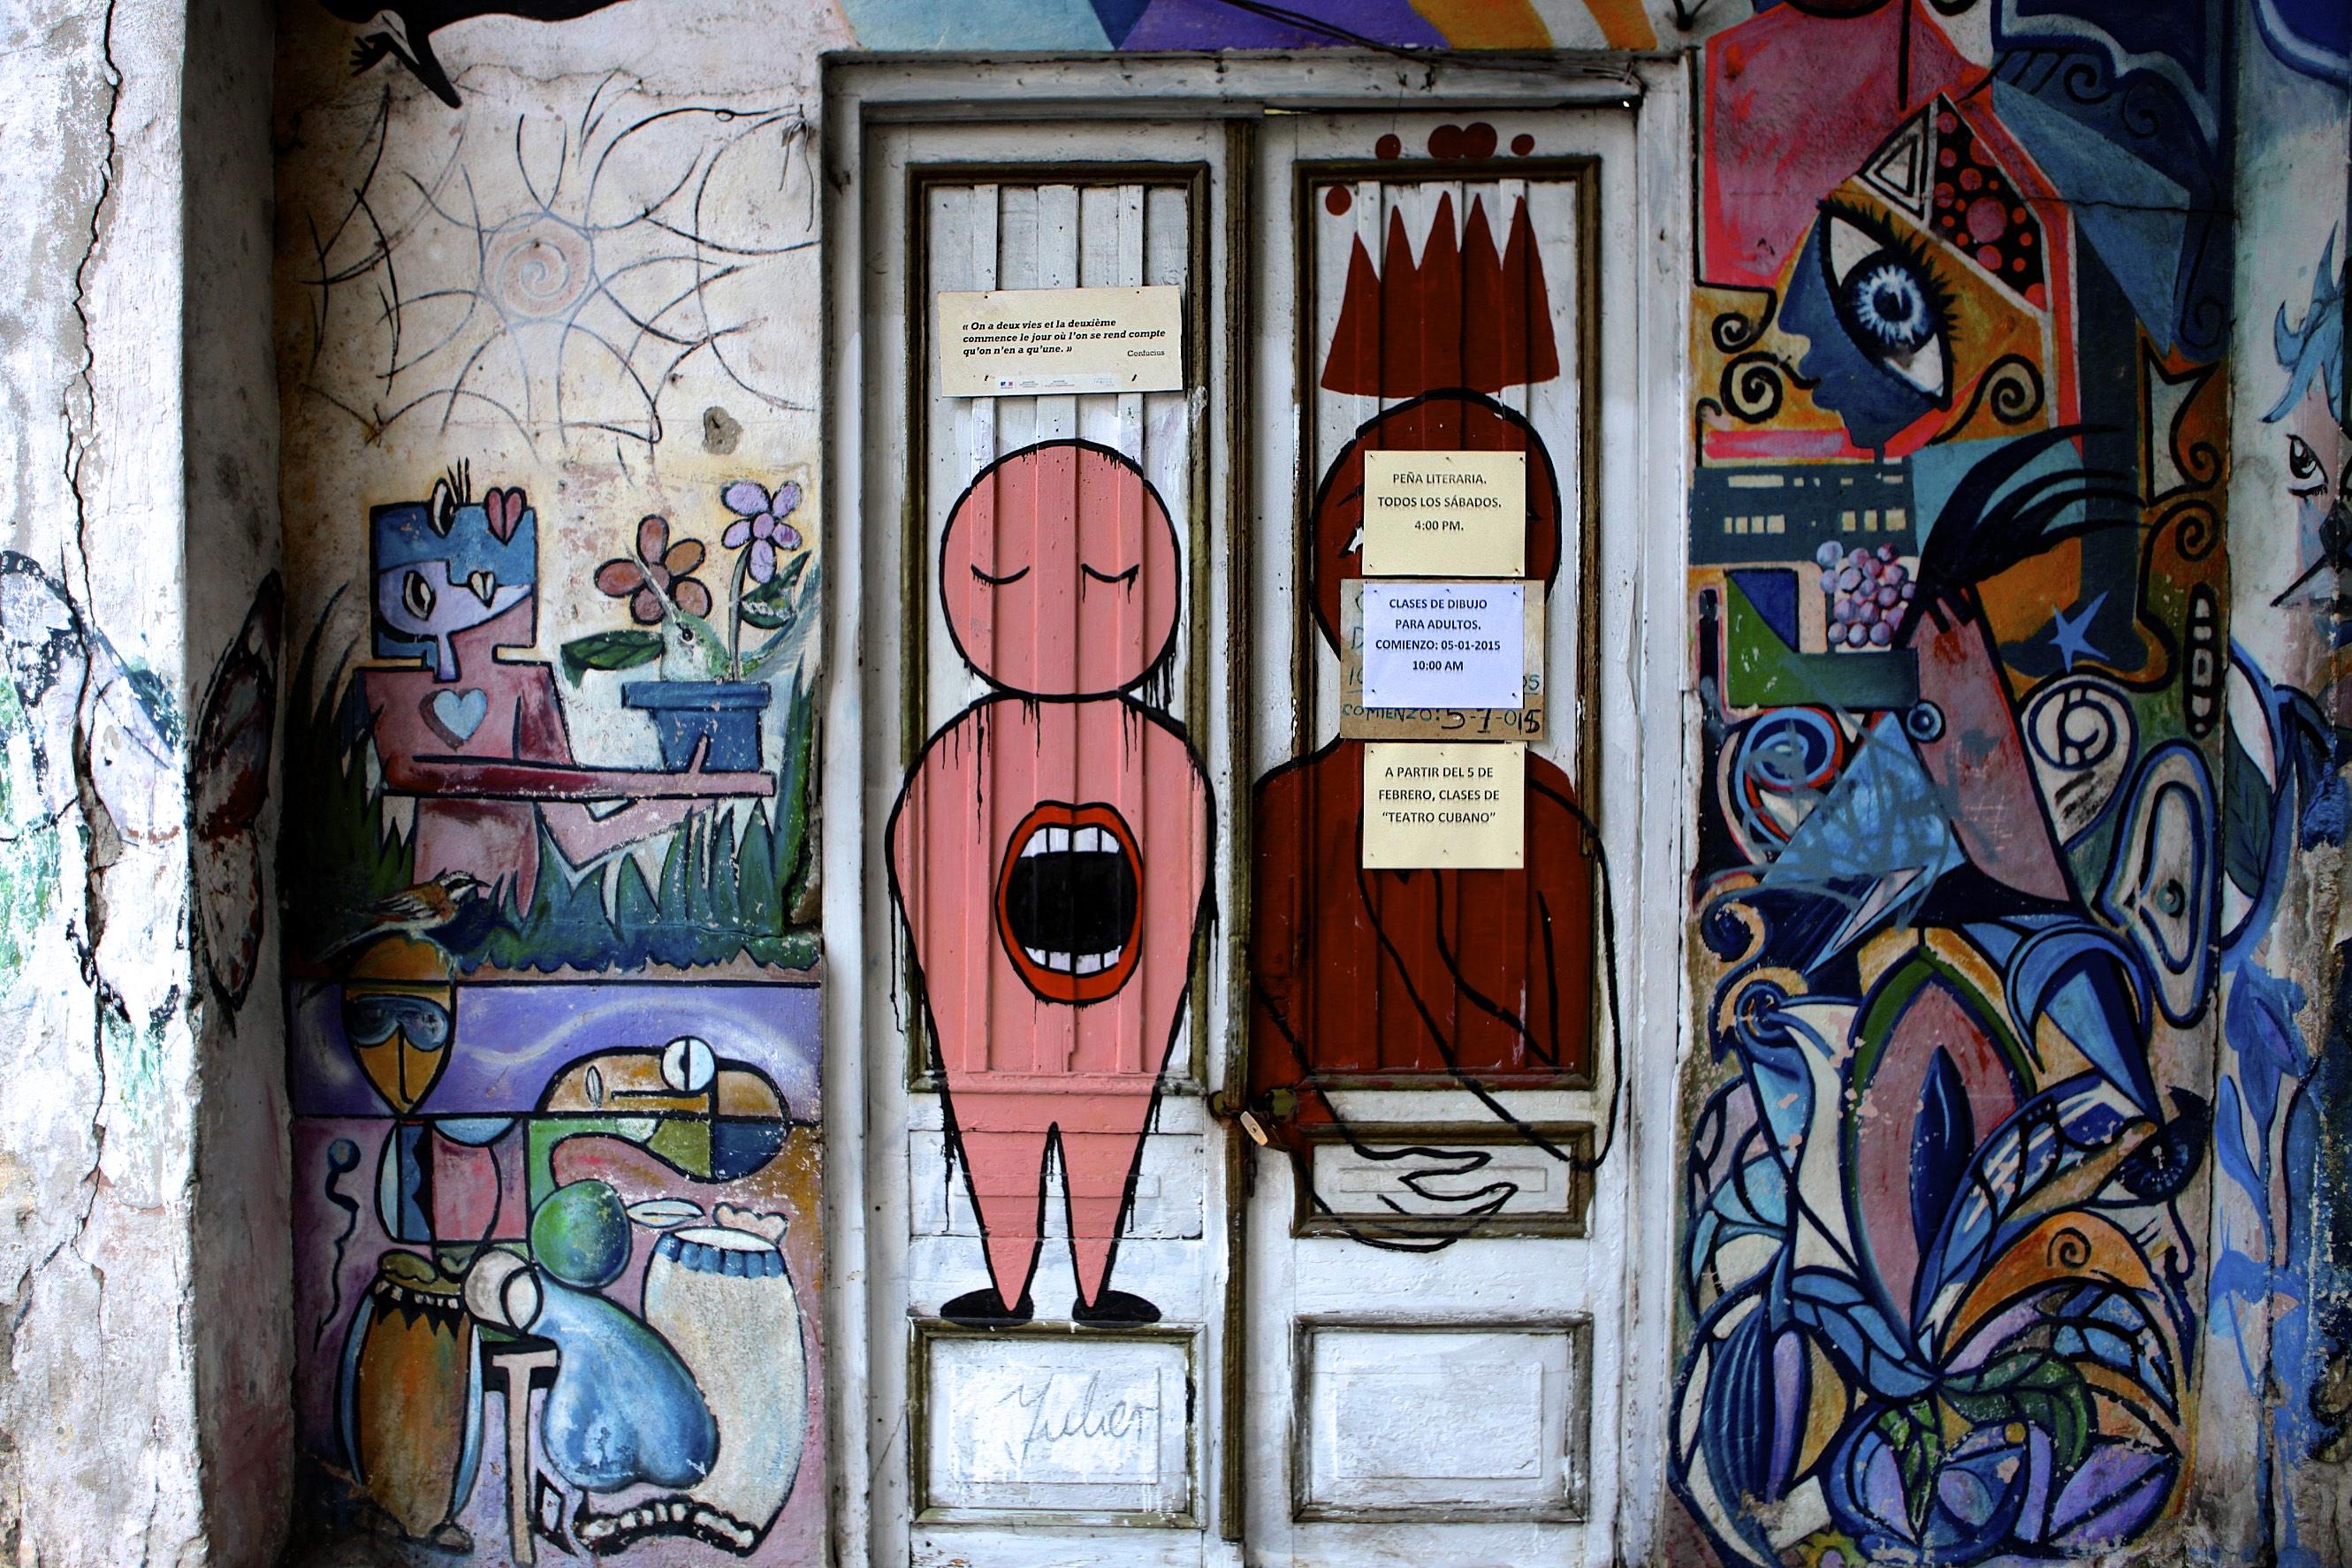 Gallery Door – On the Prado